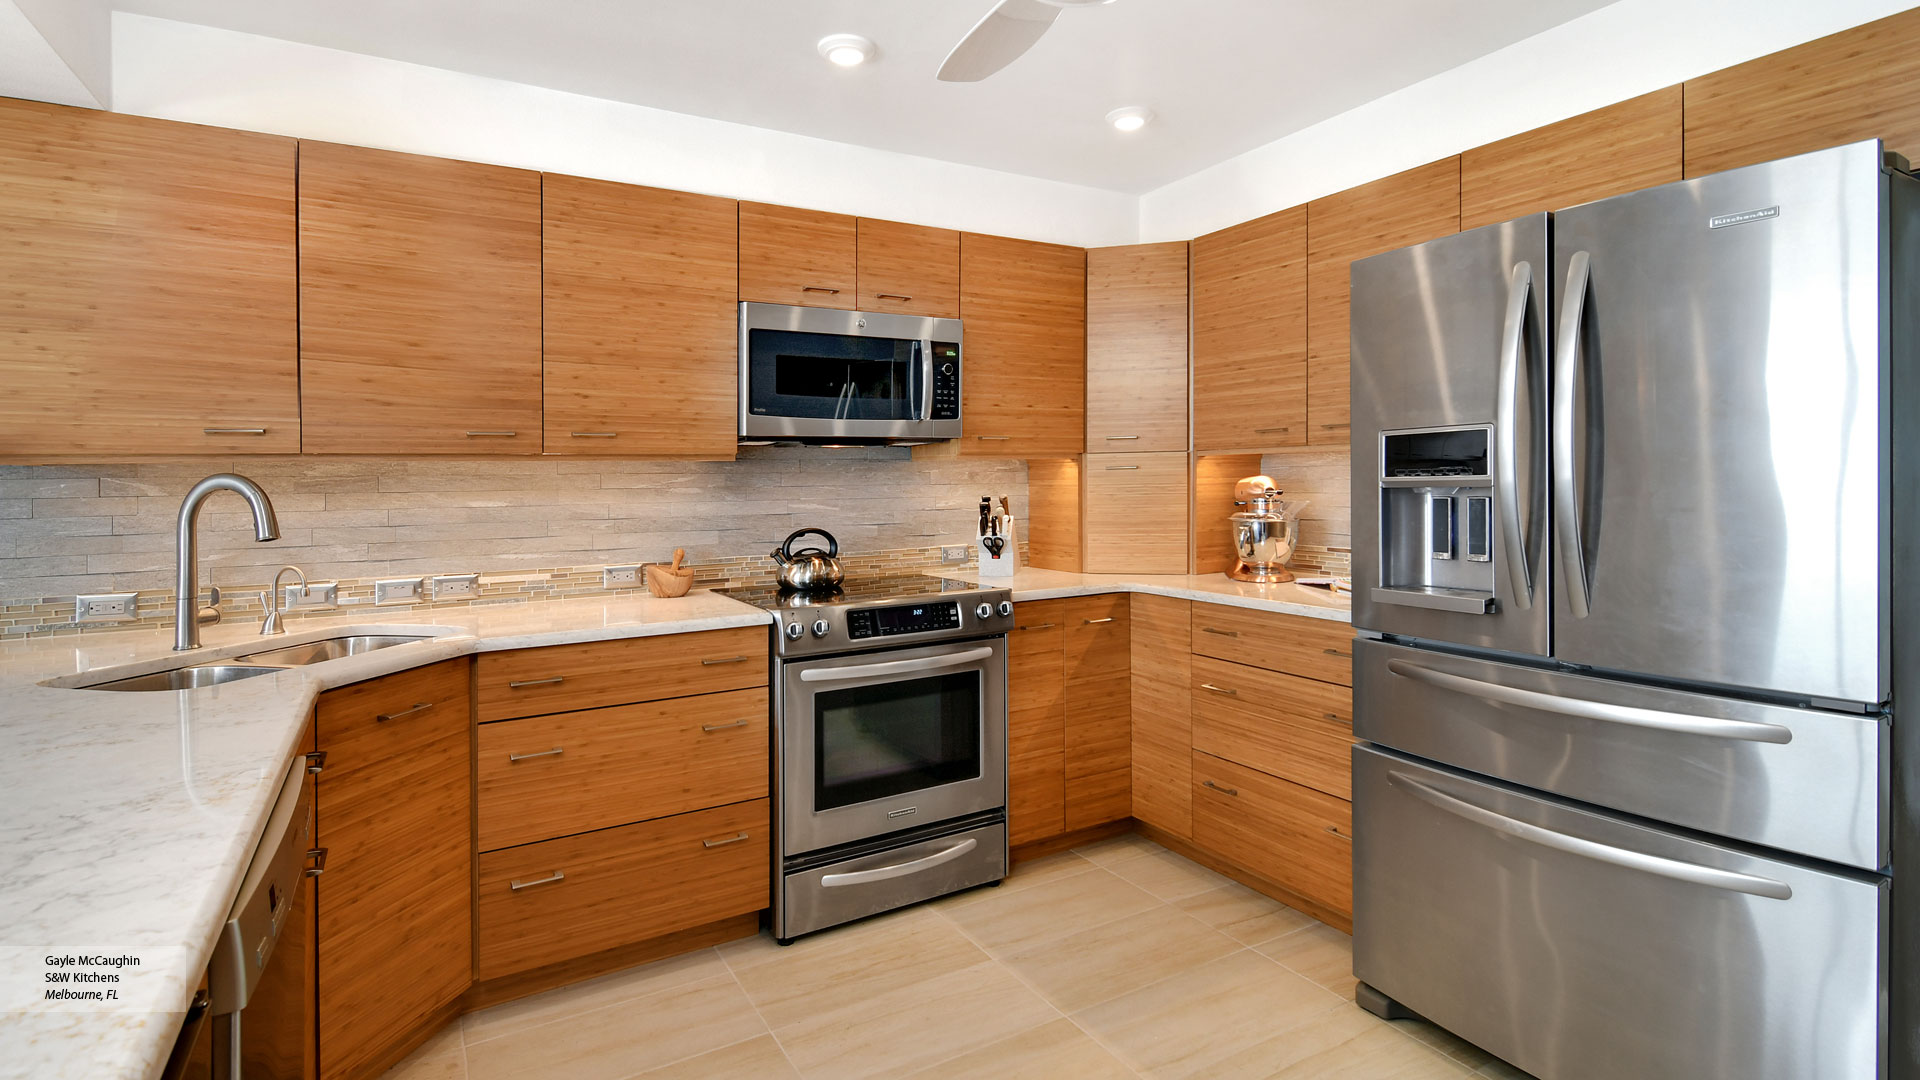 Best Kitchen Gallery: Natural Bamboo Kitchen Cabi S Omega Cabi Ry of Bamboo Kitchen Cabinets on rachelxblog.com